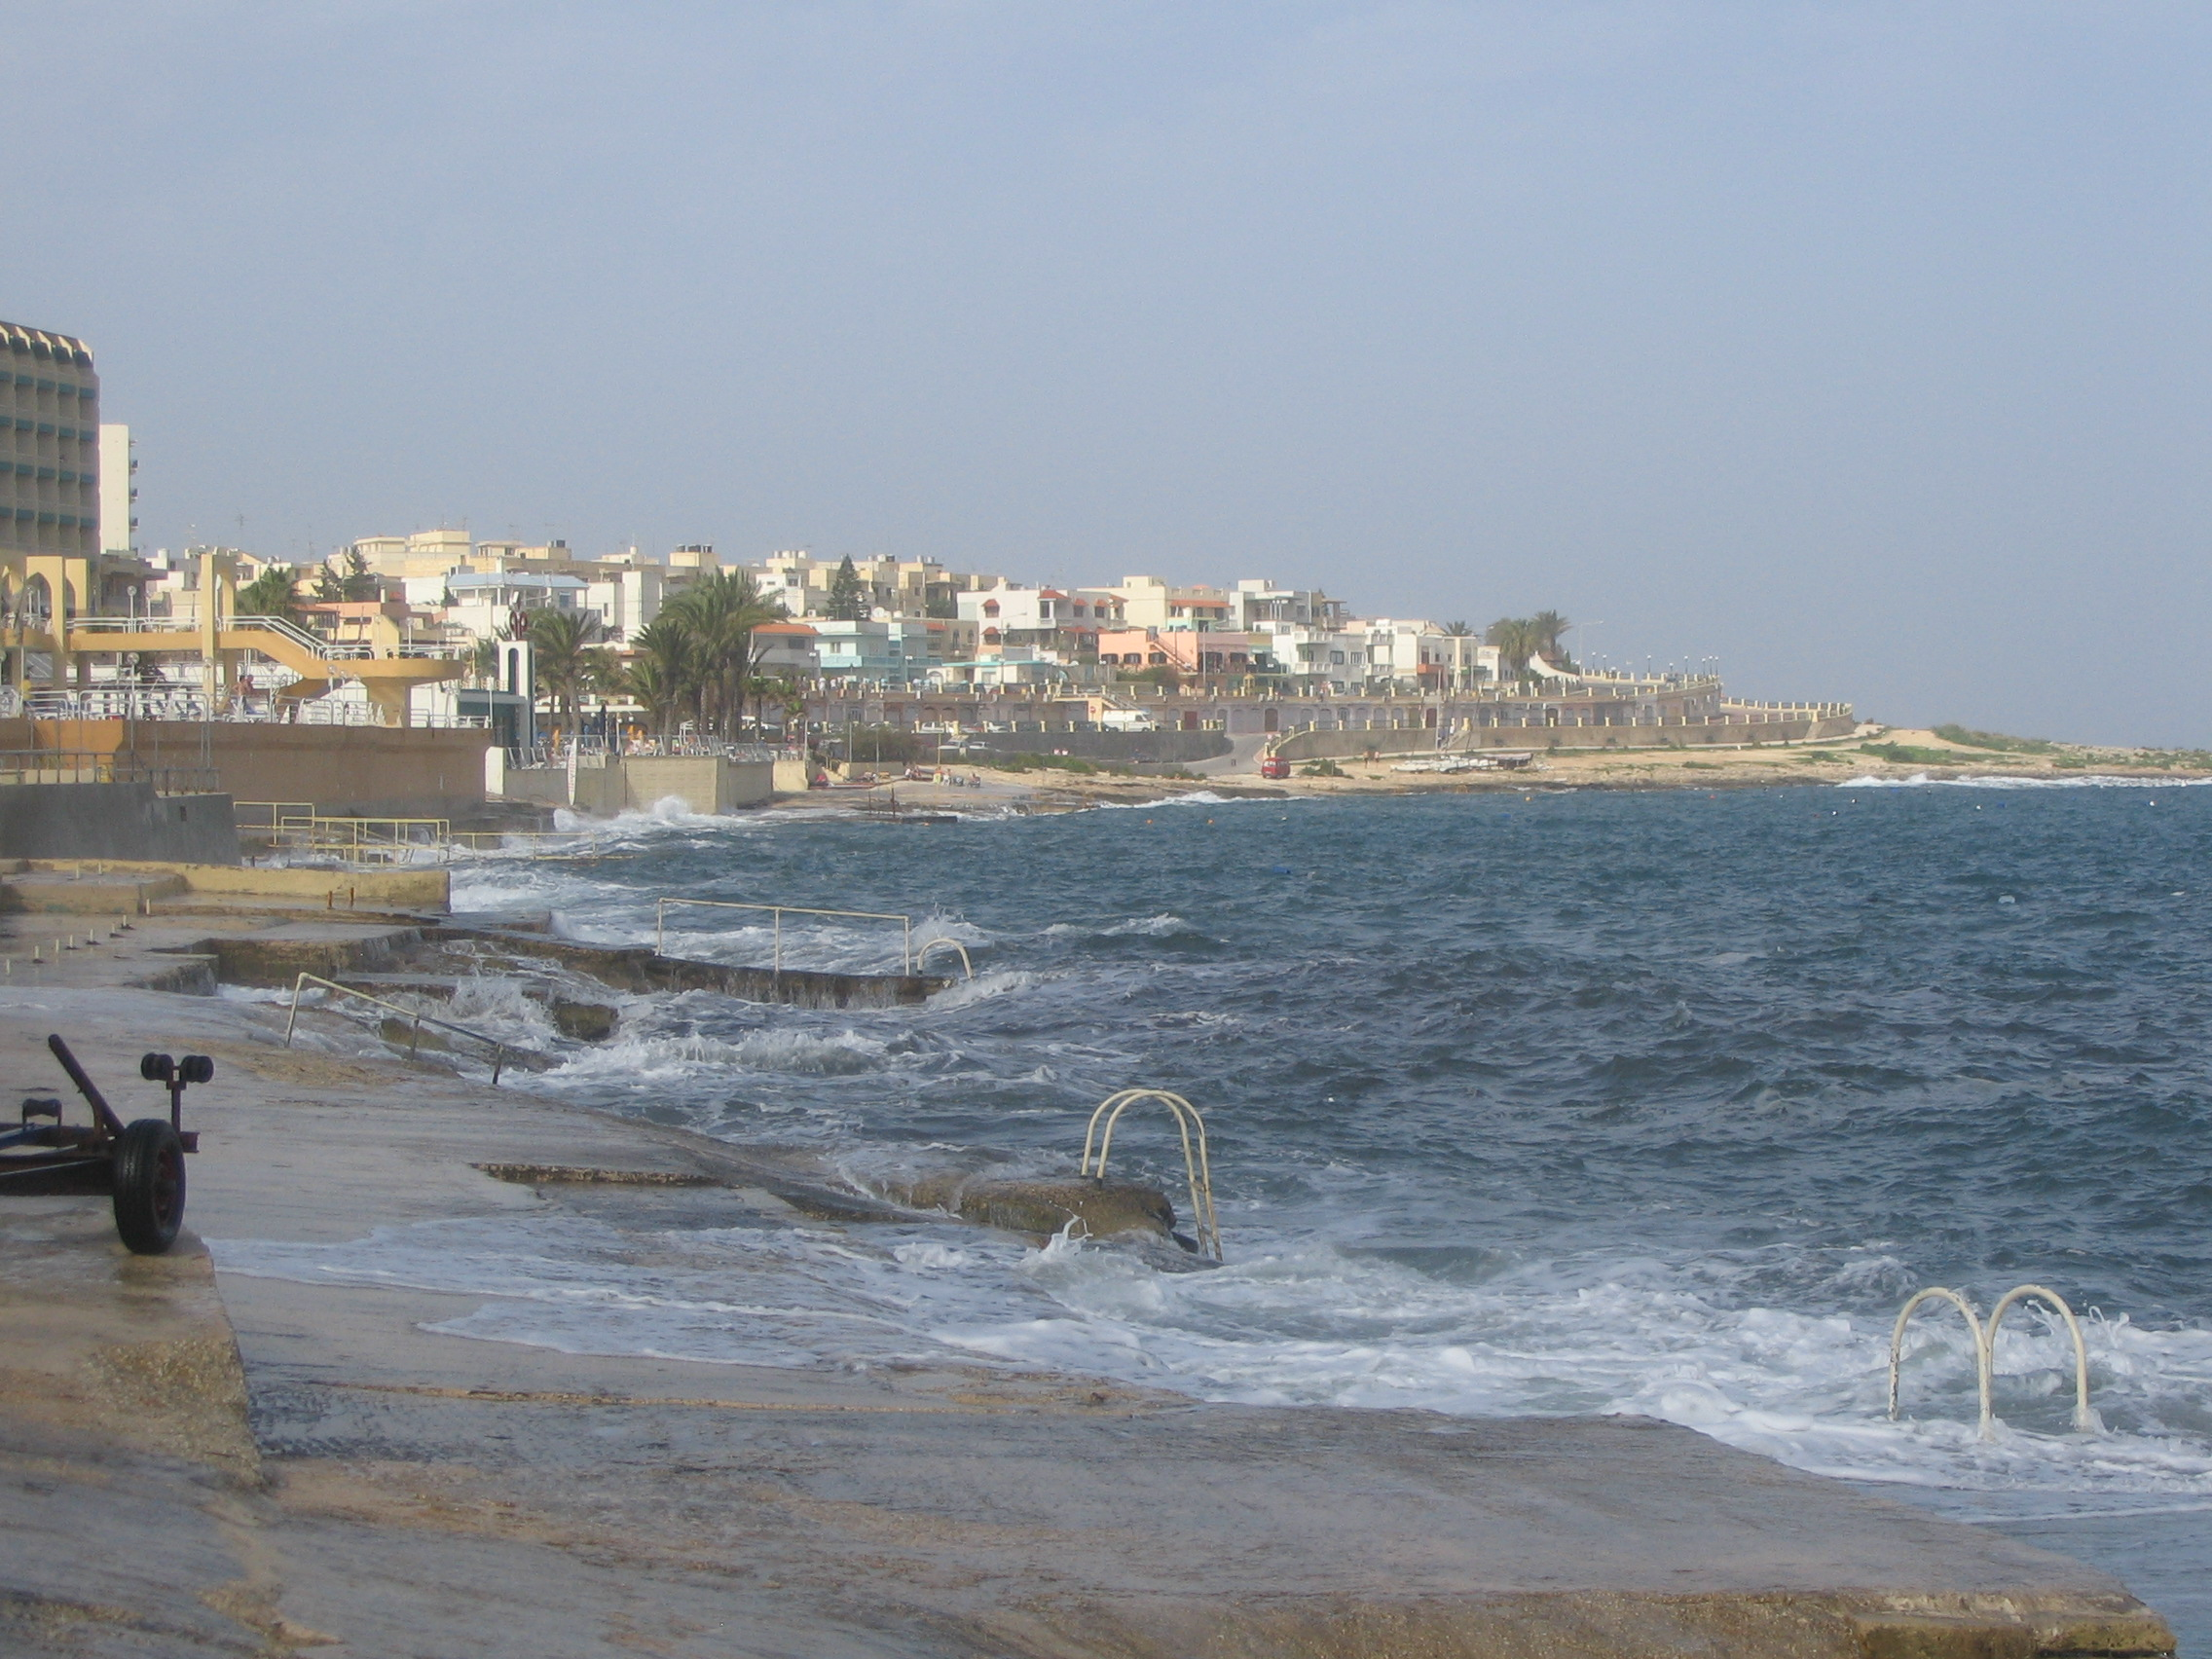 Ägypten mit Kairo, Nilkreuzfahrt und Badeurlaub 2013